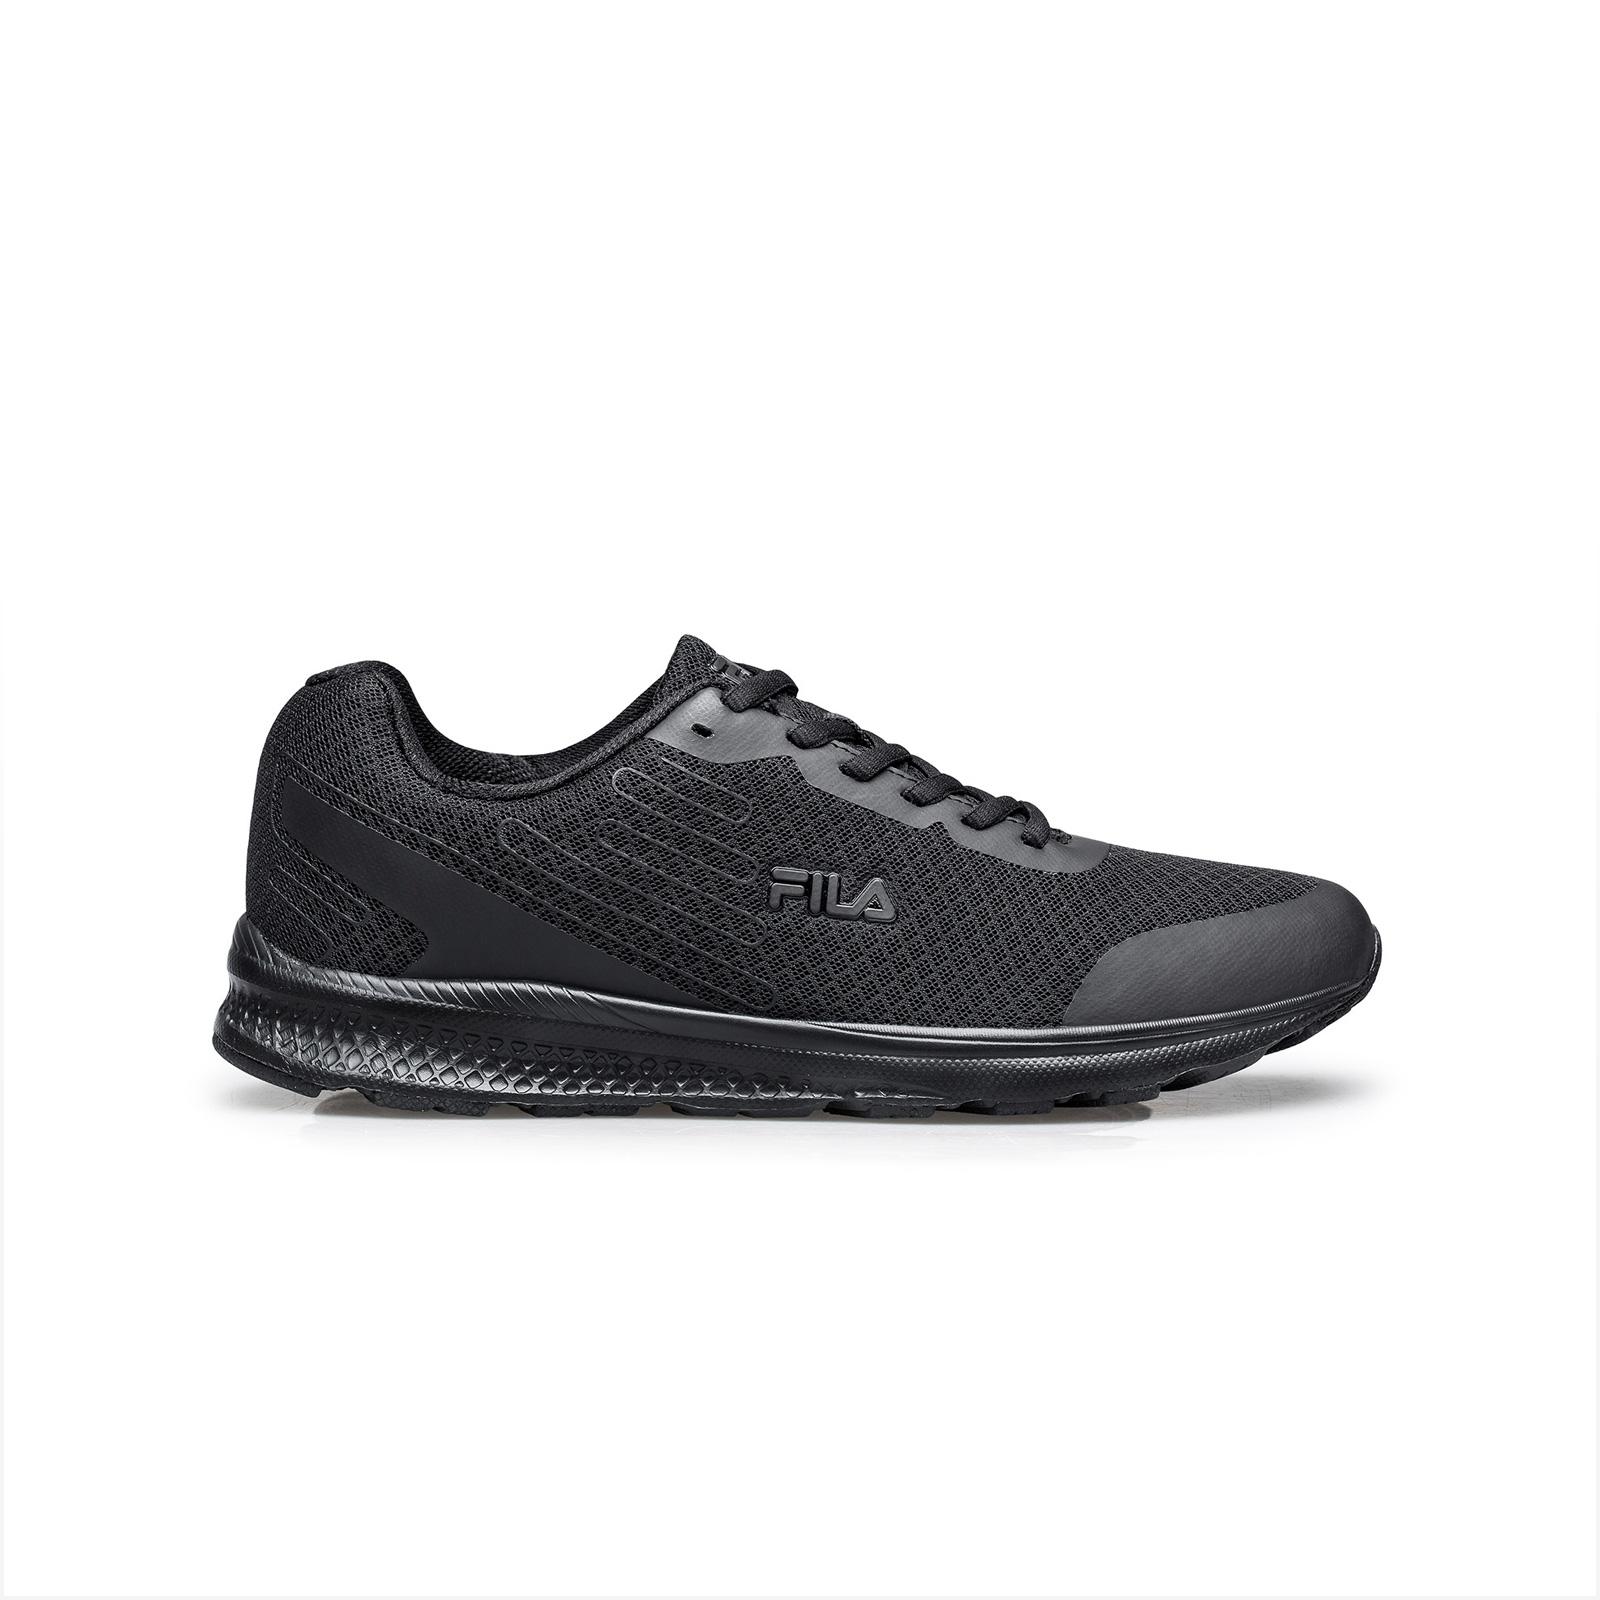 Fila - 5AF11008 CASSIA FOOTWEAR - . BLACK